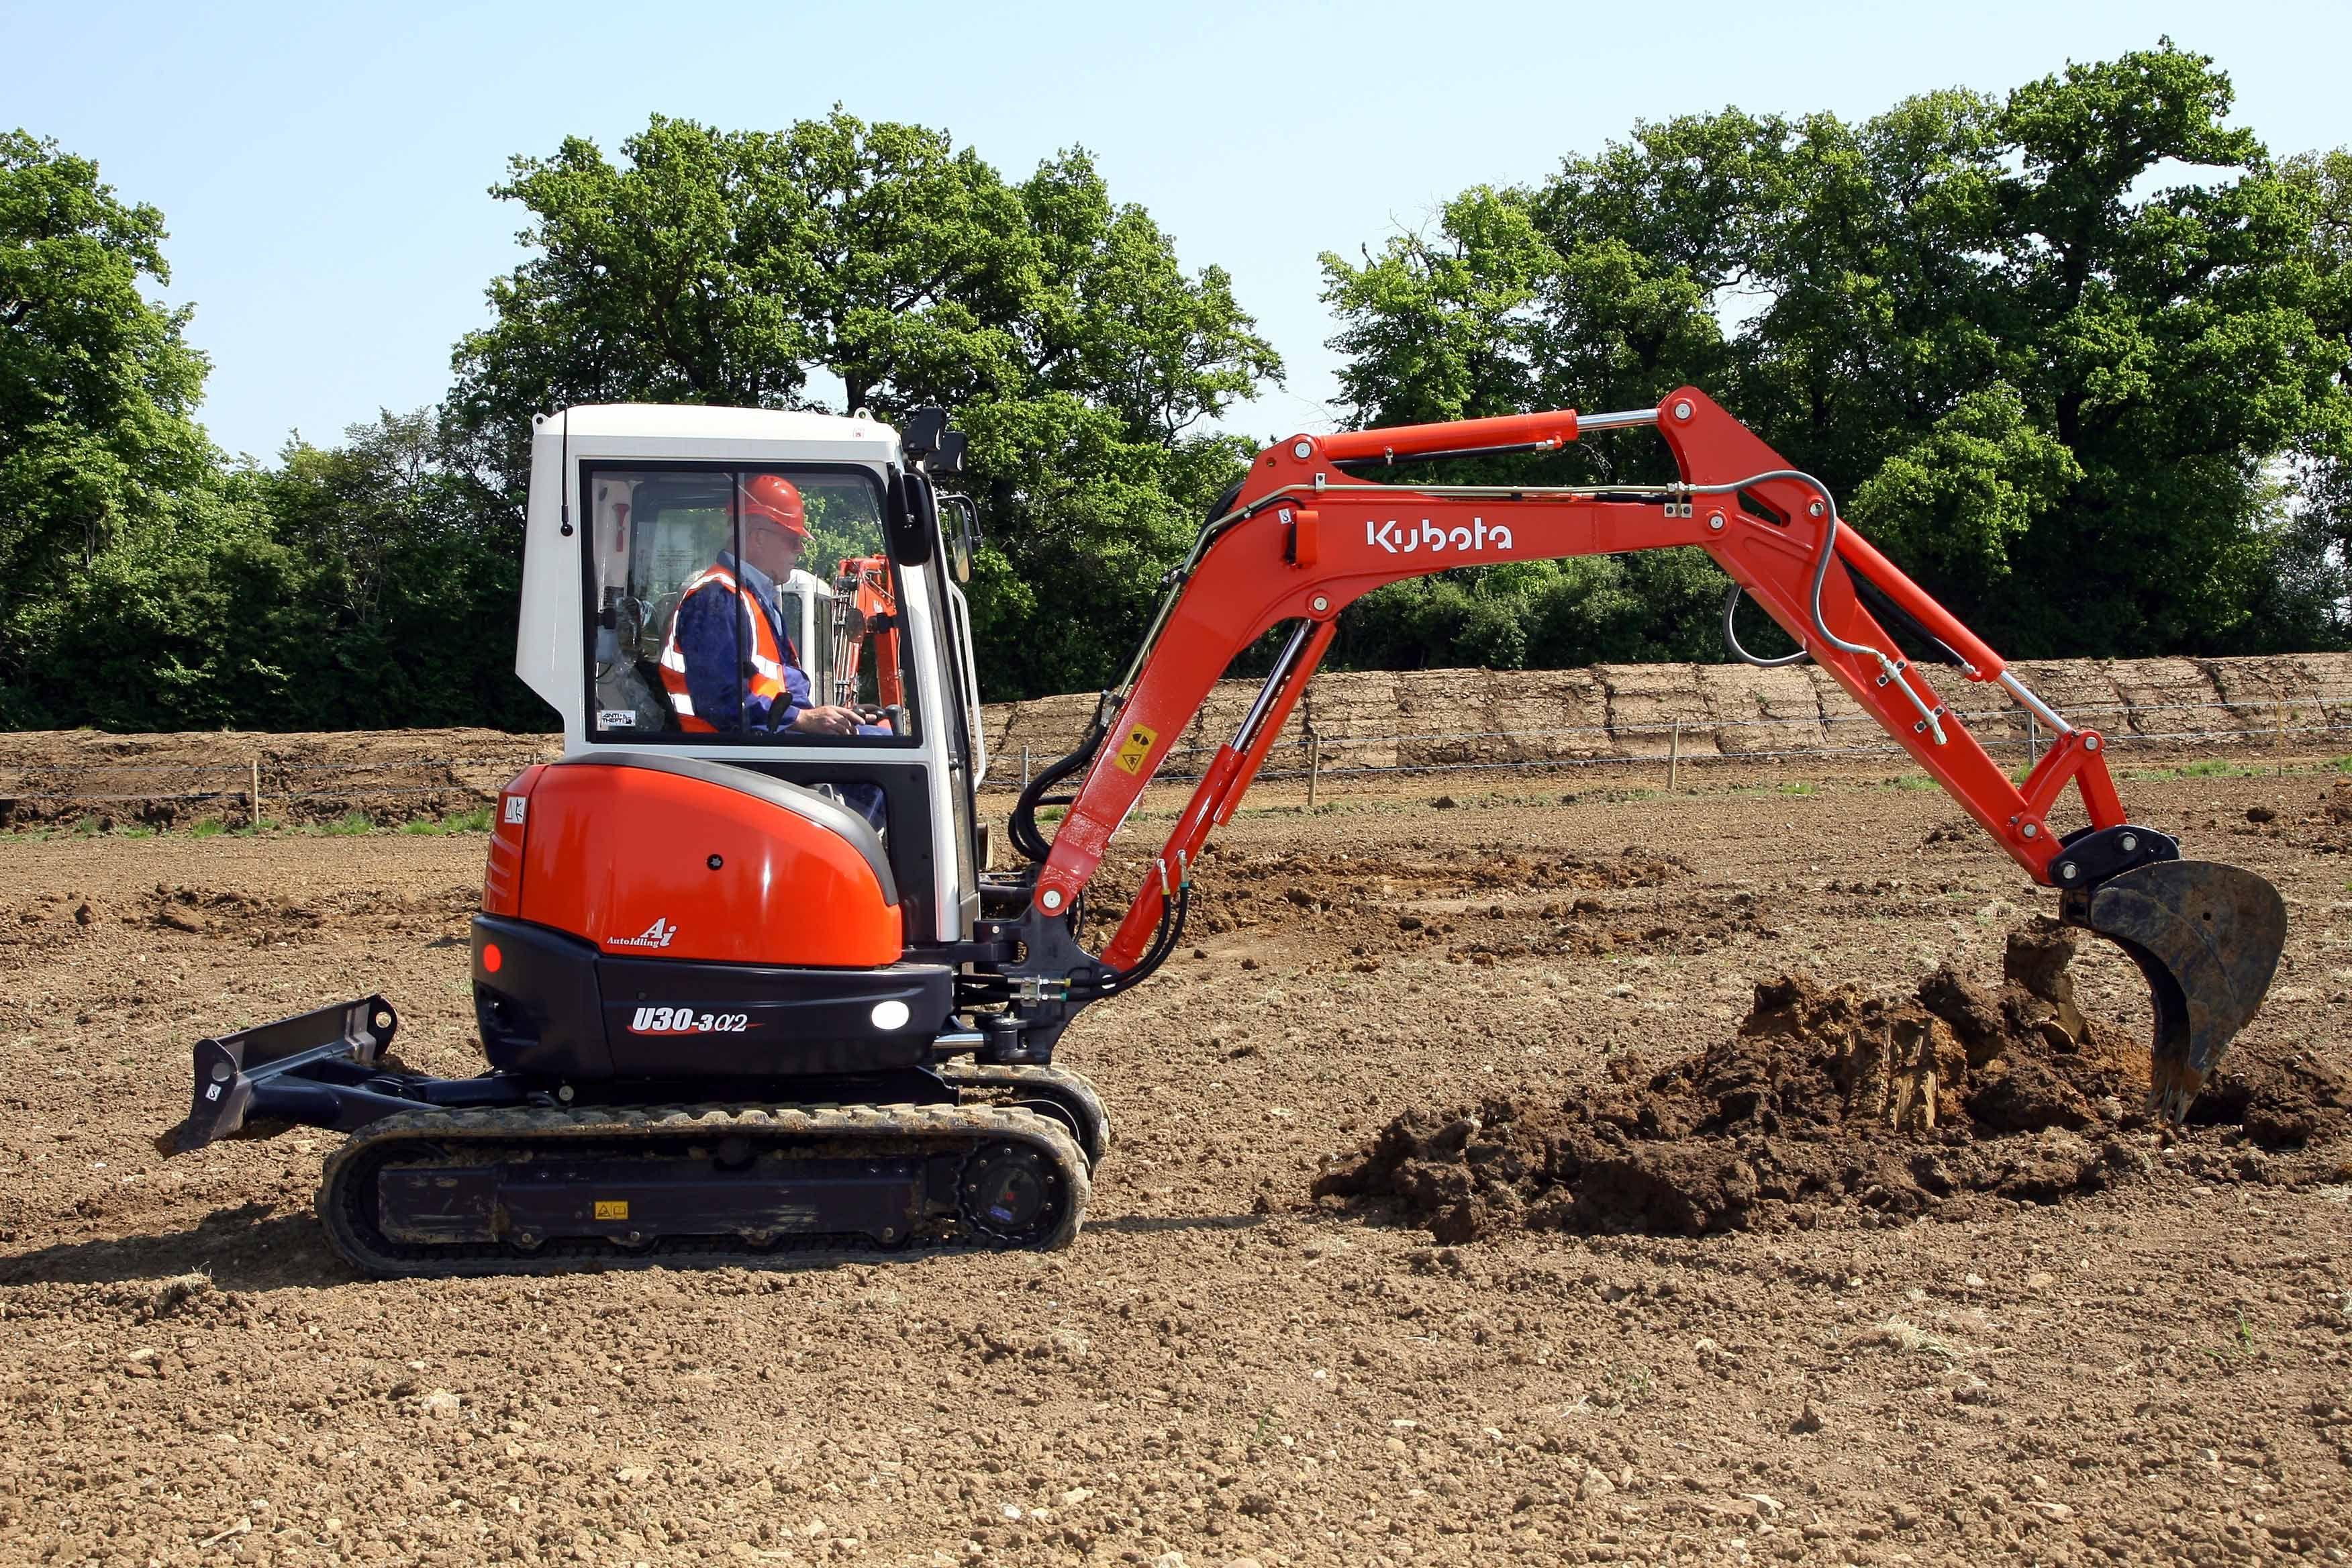 mini excavator - Google Search   Tractor   Pinterest   Tractor